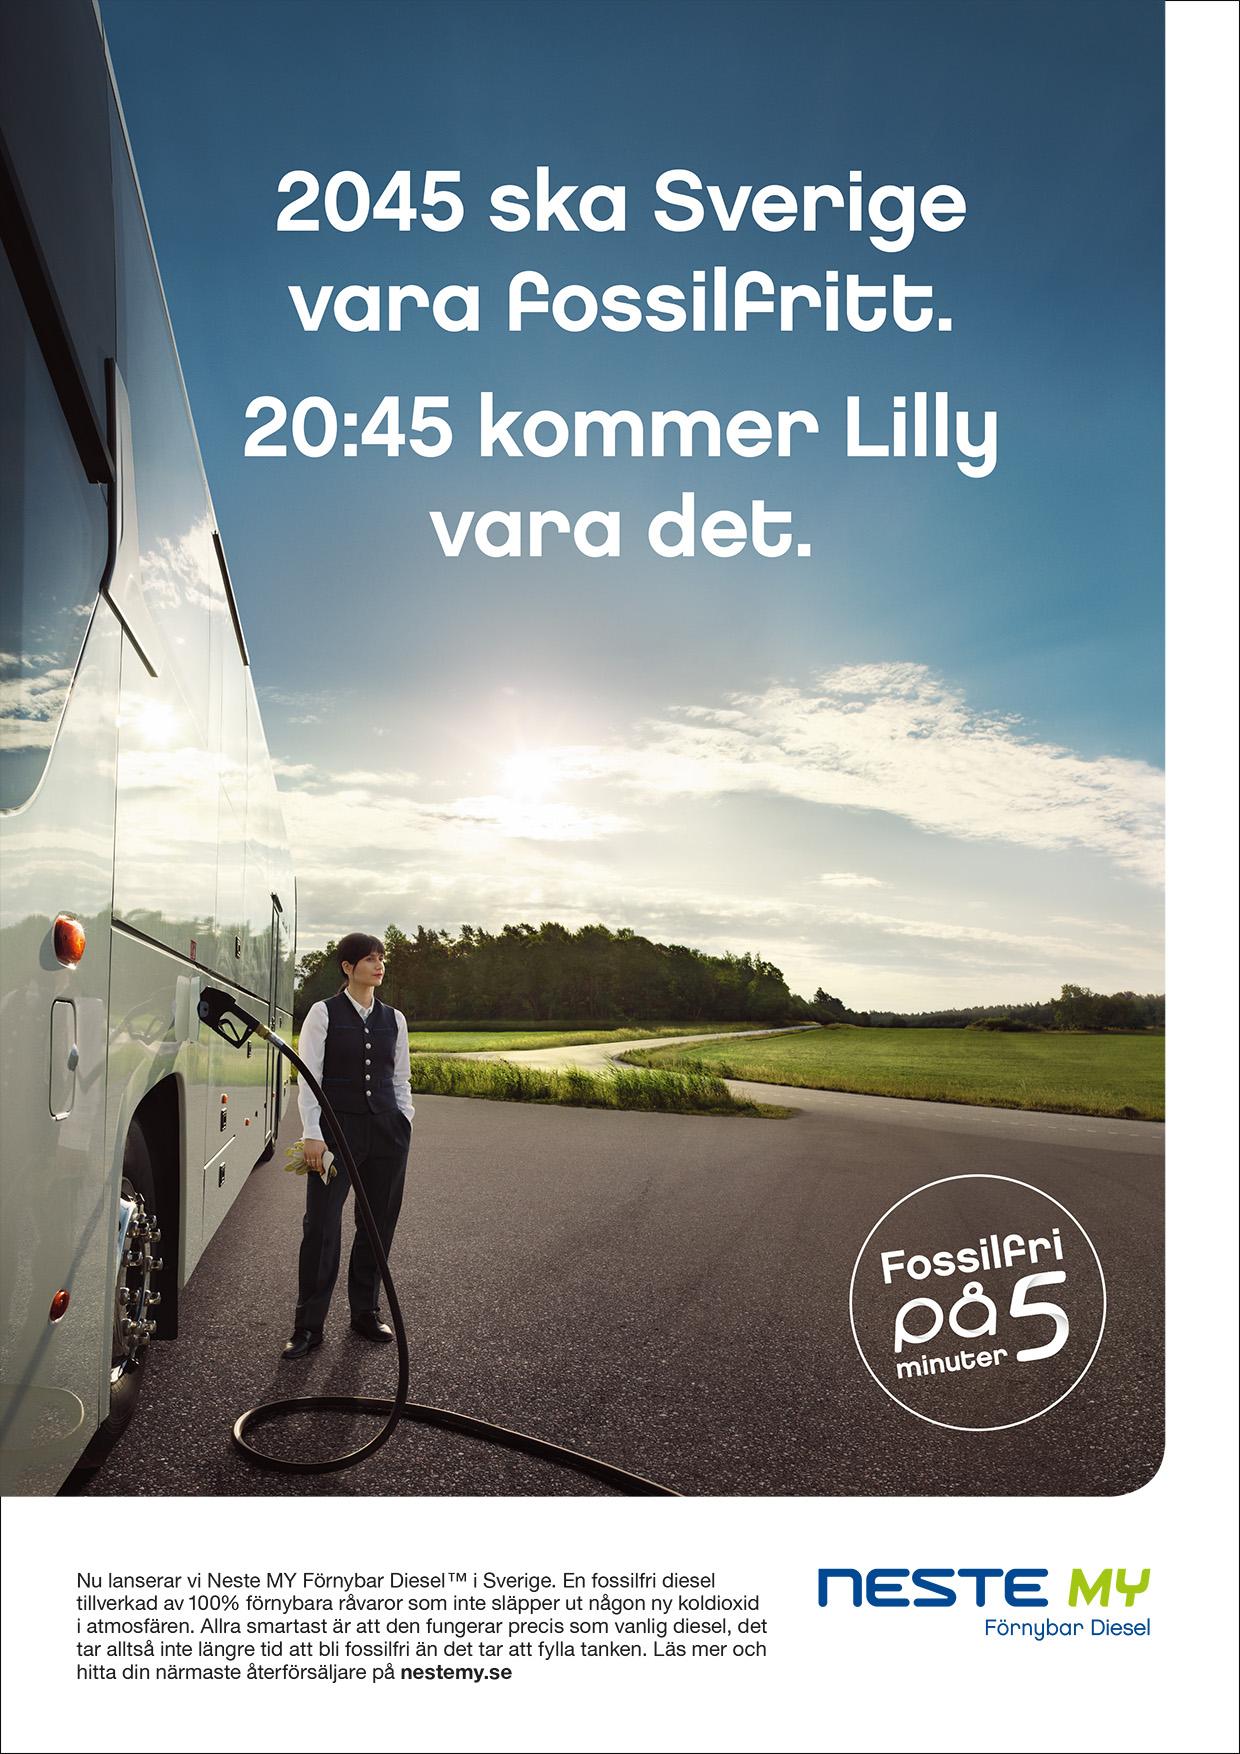 Neste_buss2045_210x297_Cirkulation_181205.jpg